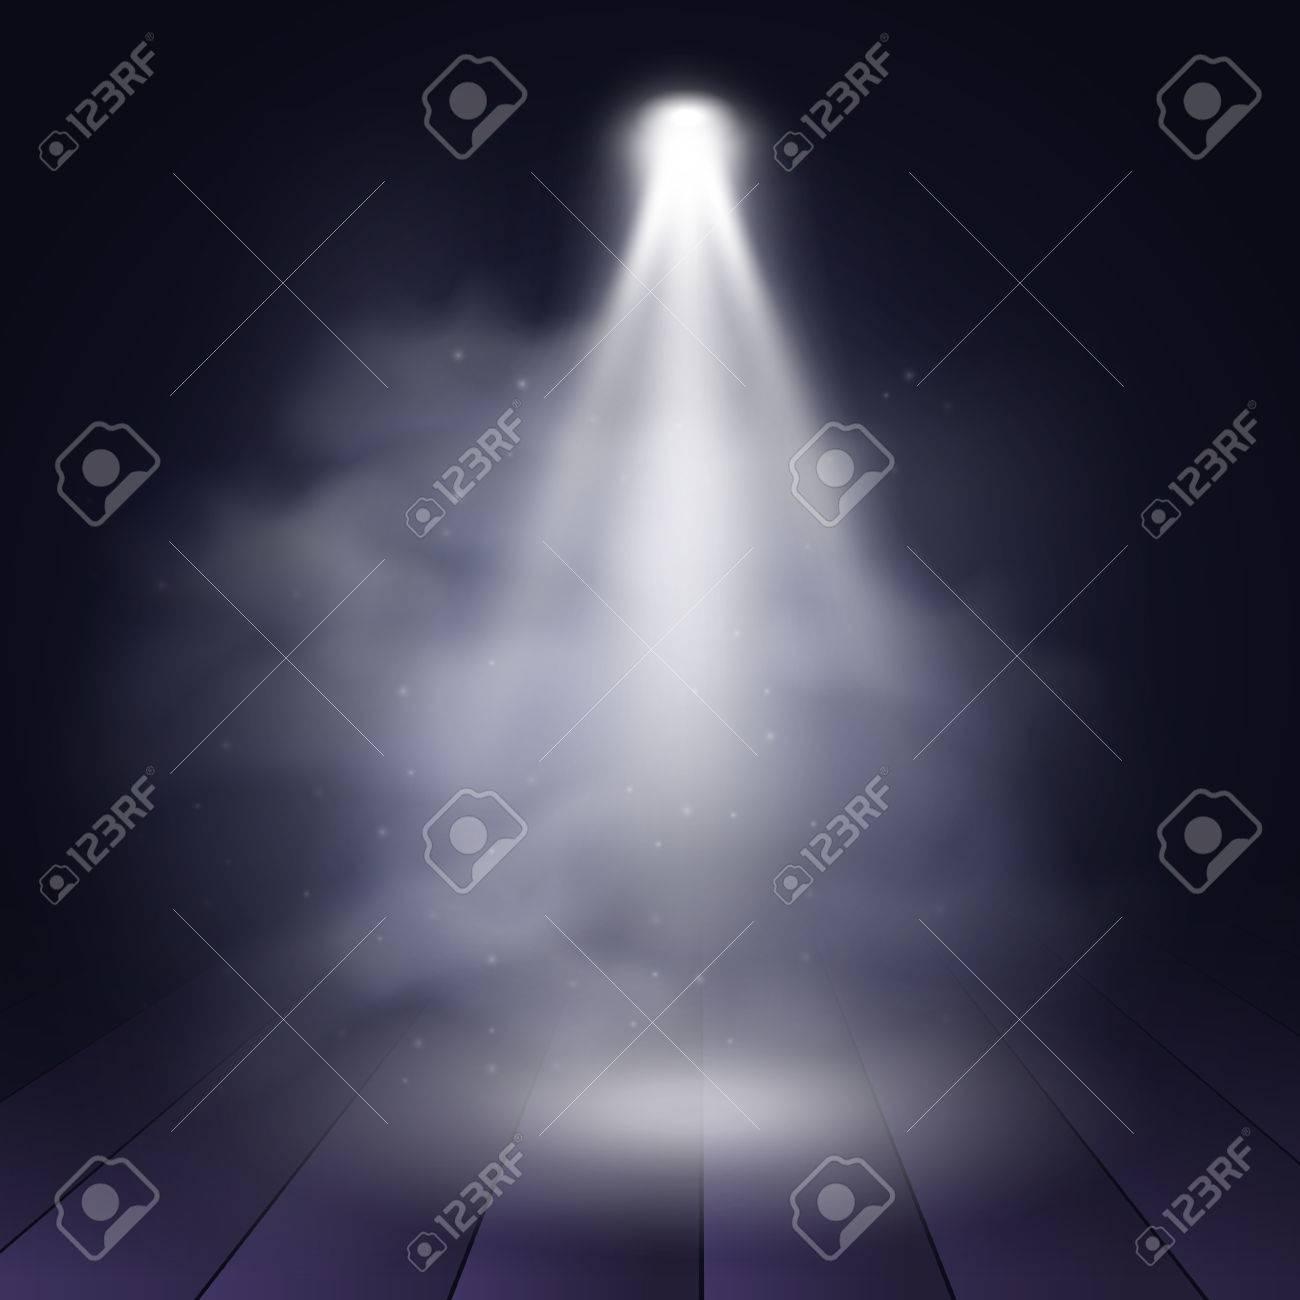 Spotlight disco illuminated wooden scene decoration club theater. Vector projection presentation background illustartion. Spotlight background vector. Stage spotlight. Spotlight effect on scene. - 59722468